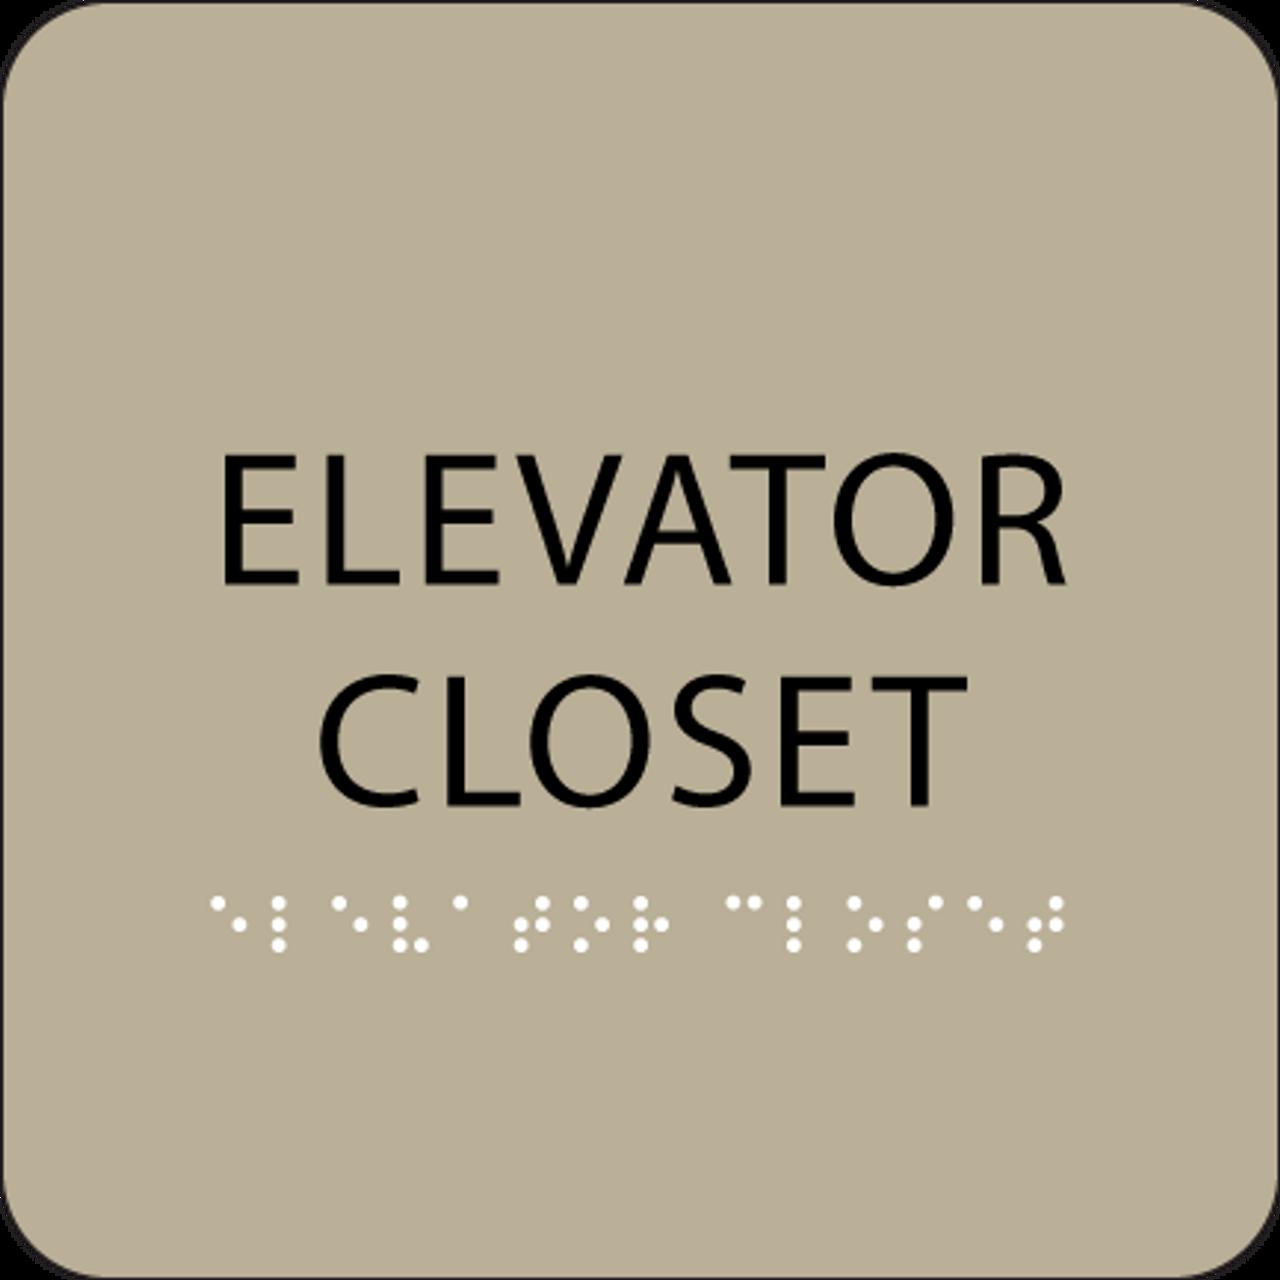 Brown ADA Elevator Closet Sign